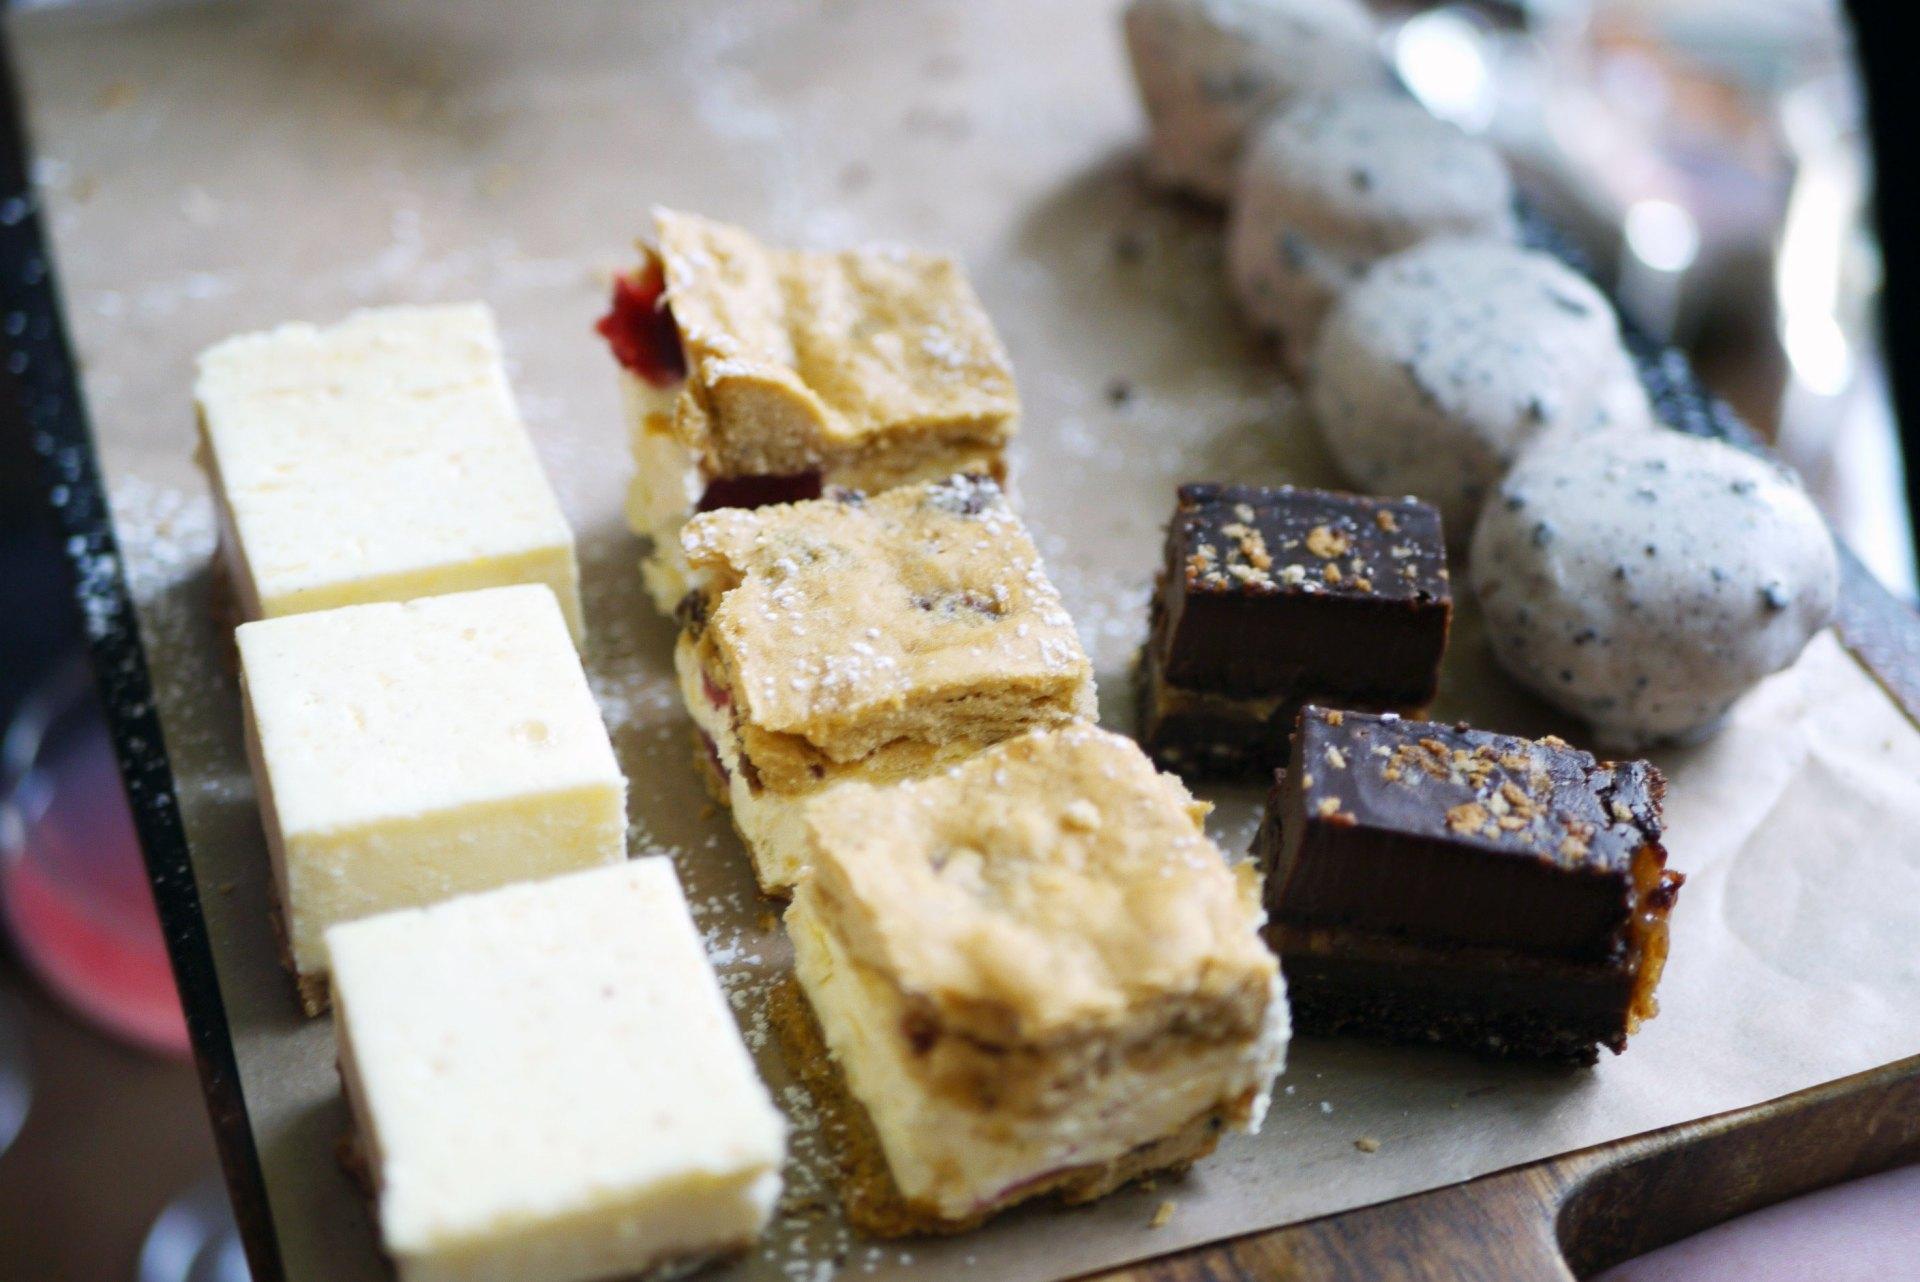 (L-R) Clotted cream cheesecake bites, strawberry scone bites, warm brownie bites and cookie crumb profiteroles.